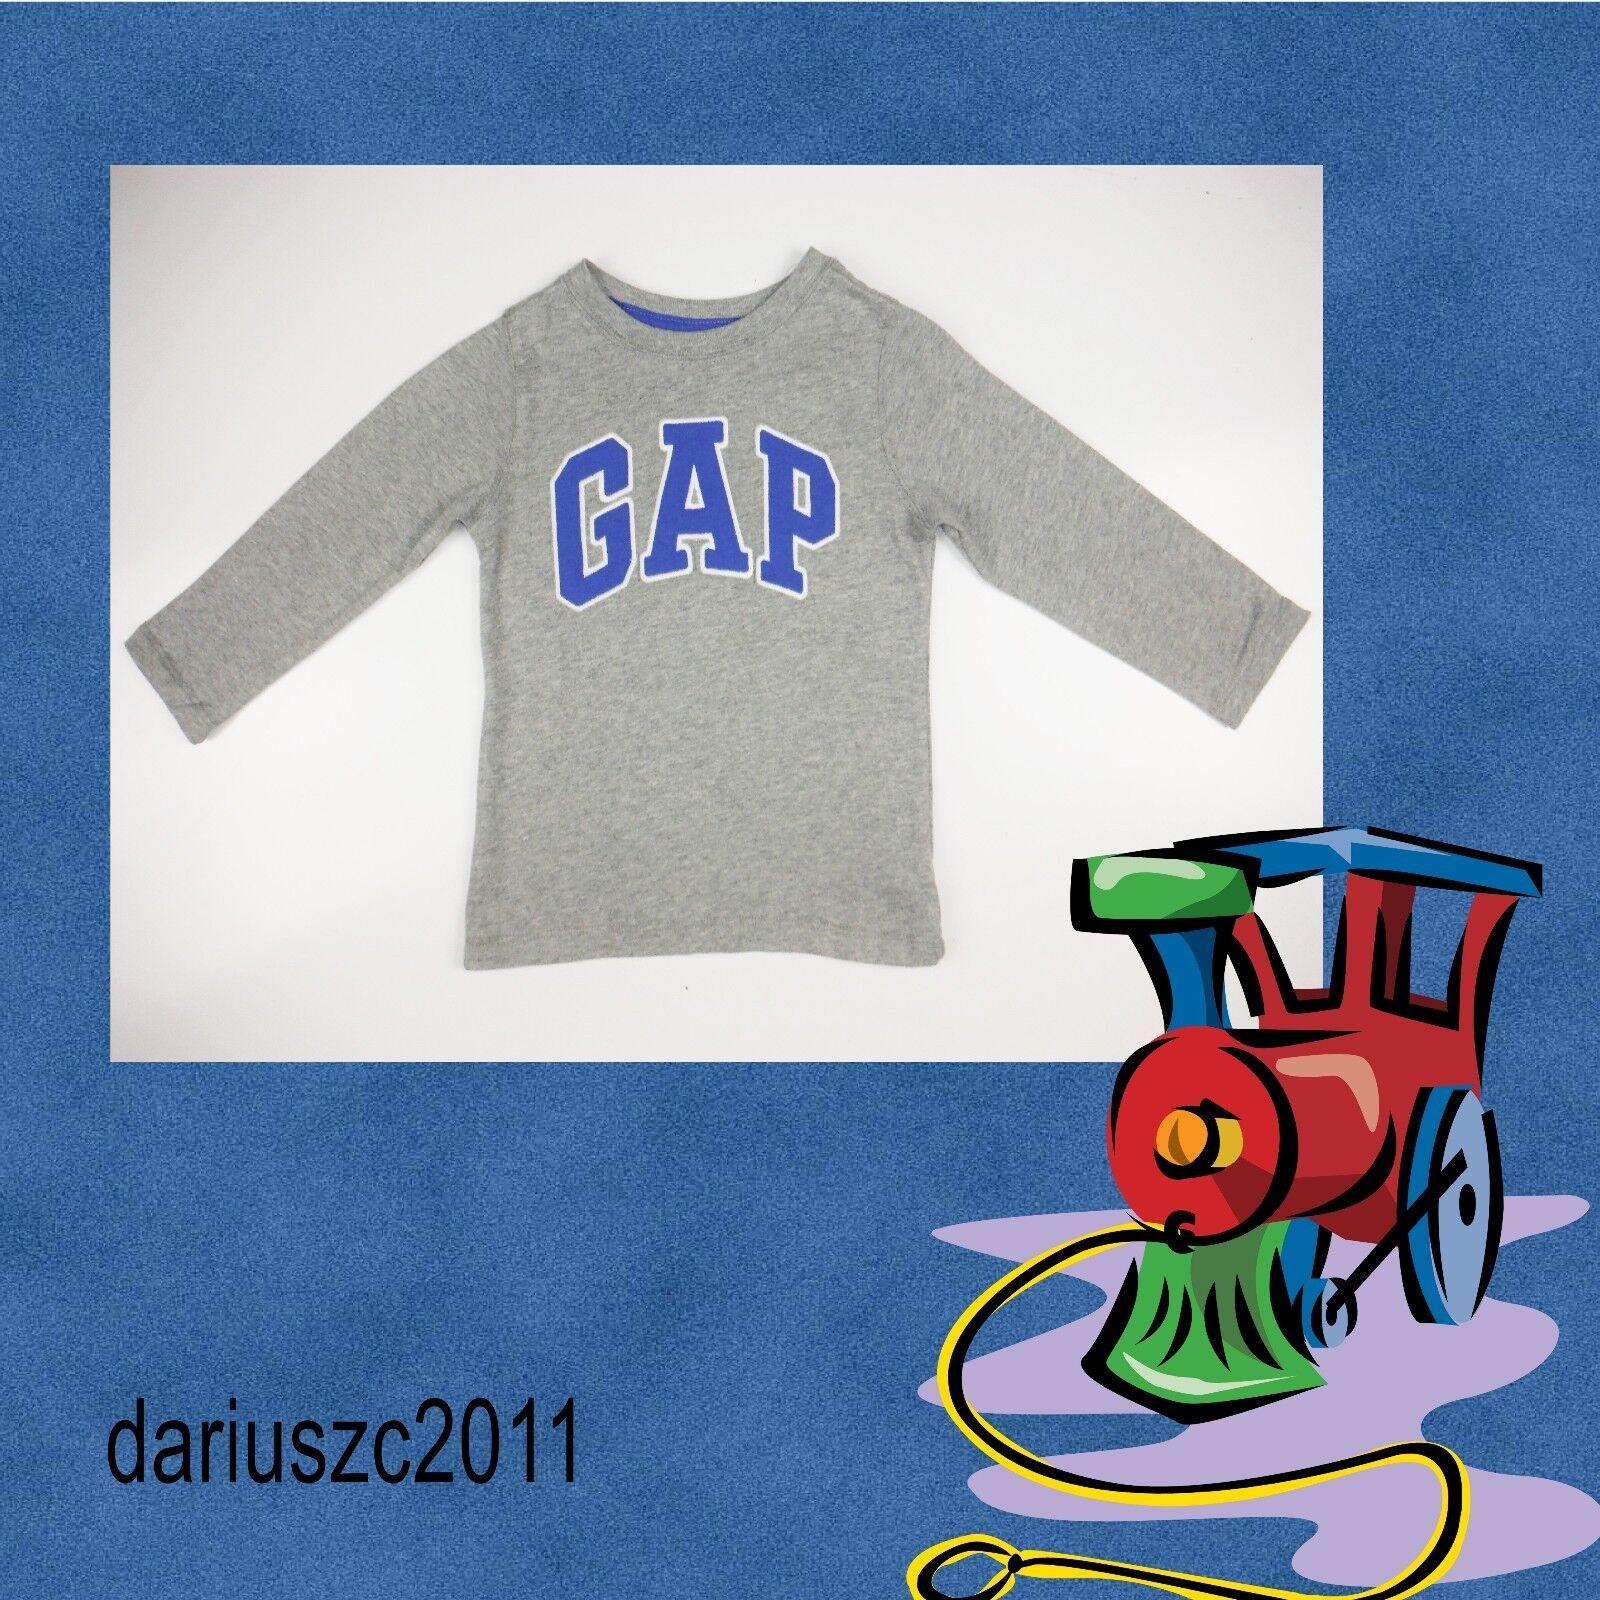 NWT BABY GAP BOYS LOGO SHIRT baseball raglan sleeves navy blue gold  u pick size